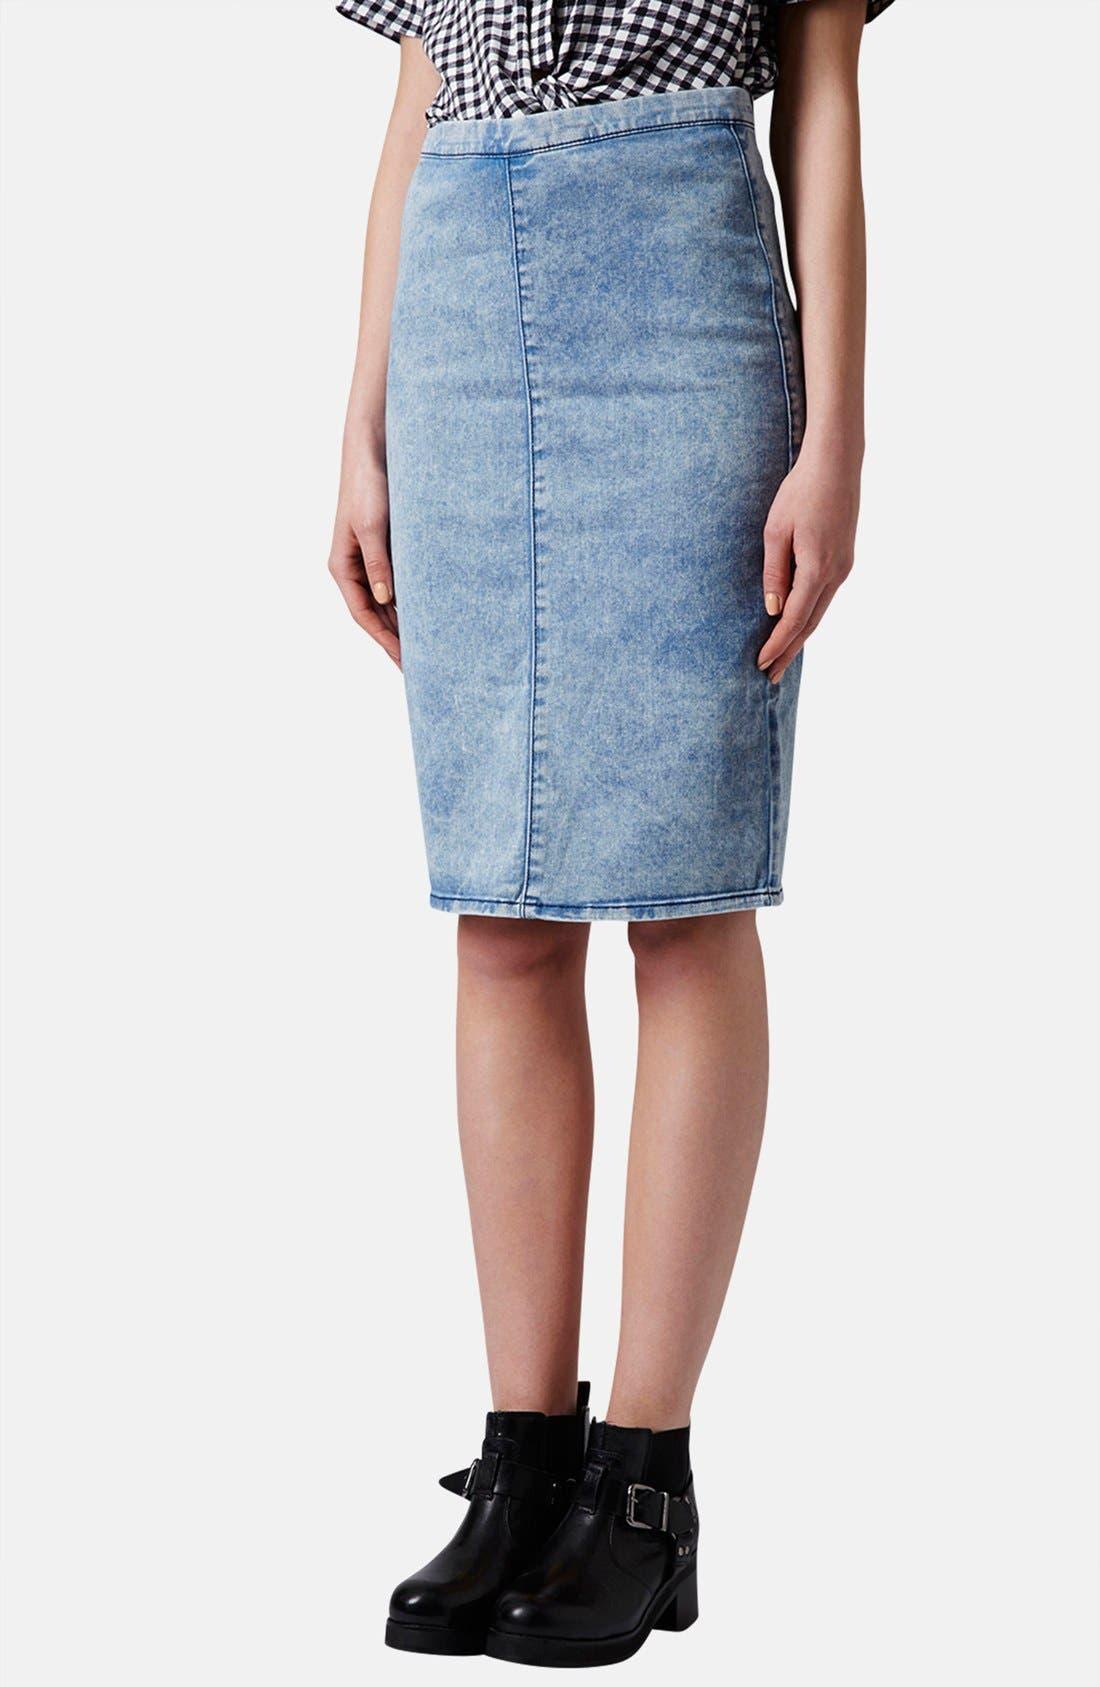 Alternate Image 1 Selected - Topshop Moto Acid Wash Denim Pencil Skirt